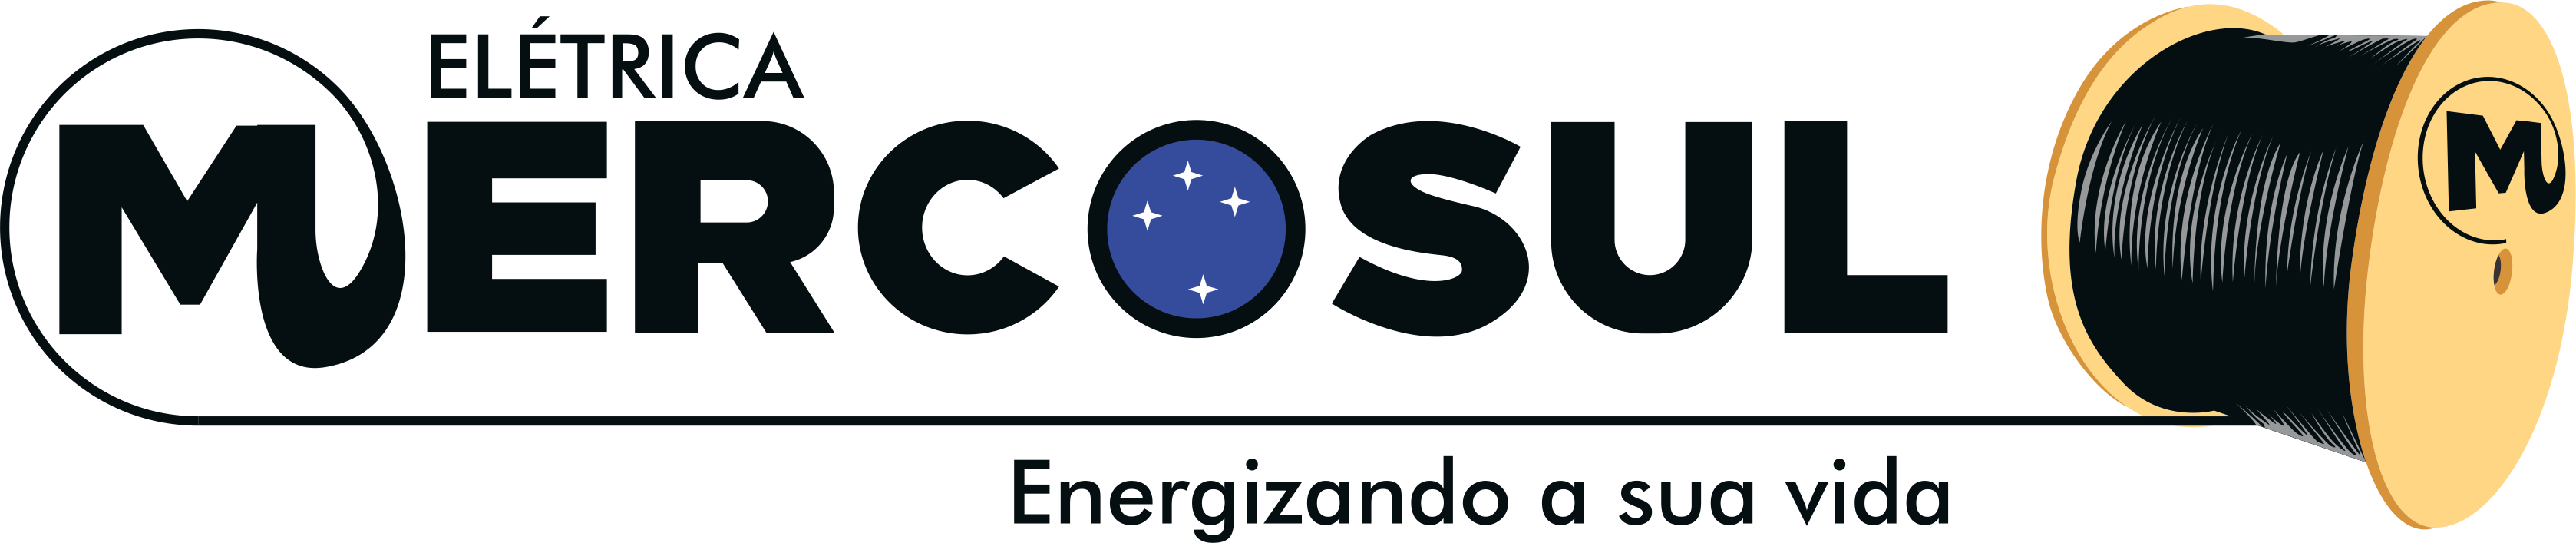 Elétrica Mercosul